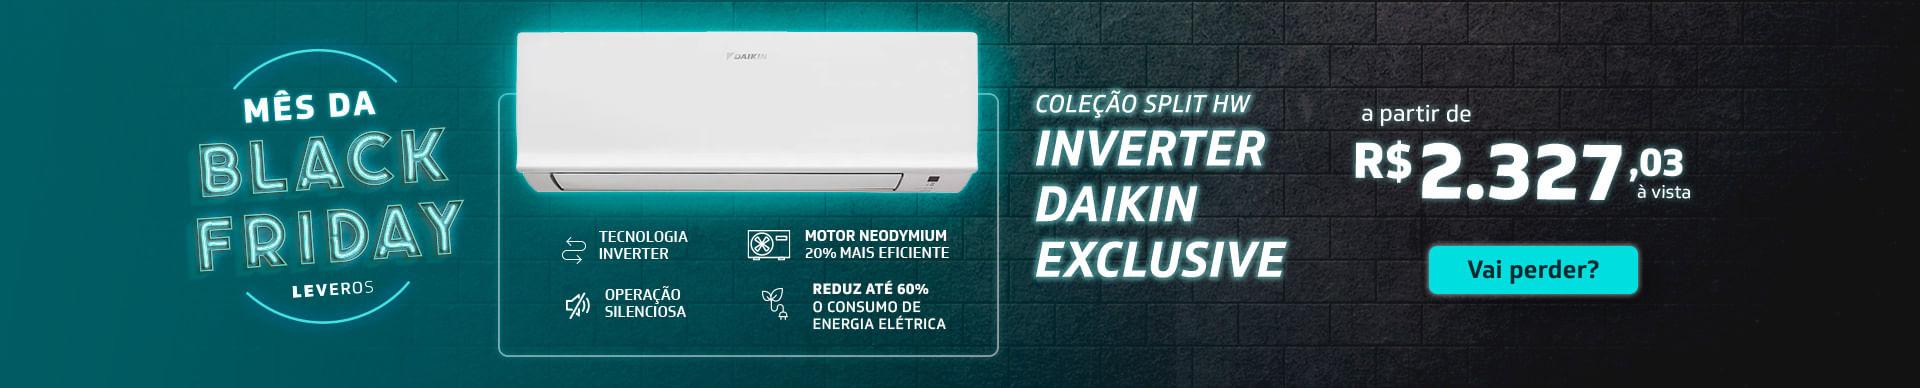 Coleção Split HW Inverter Daikin Exclusive. Vai perder?